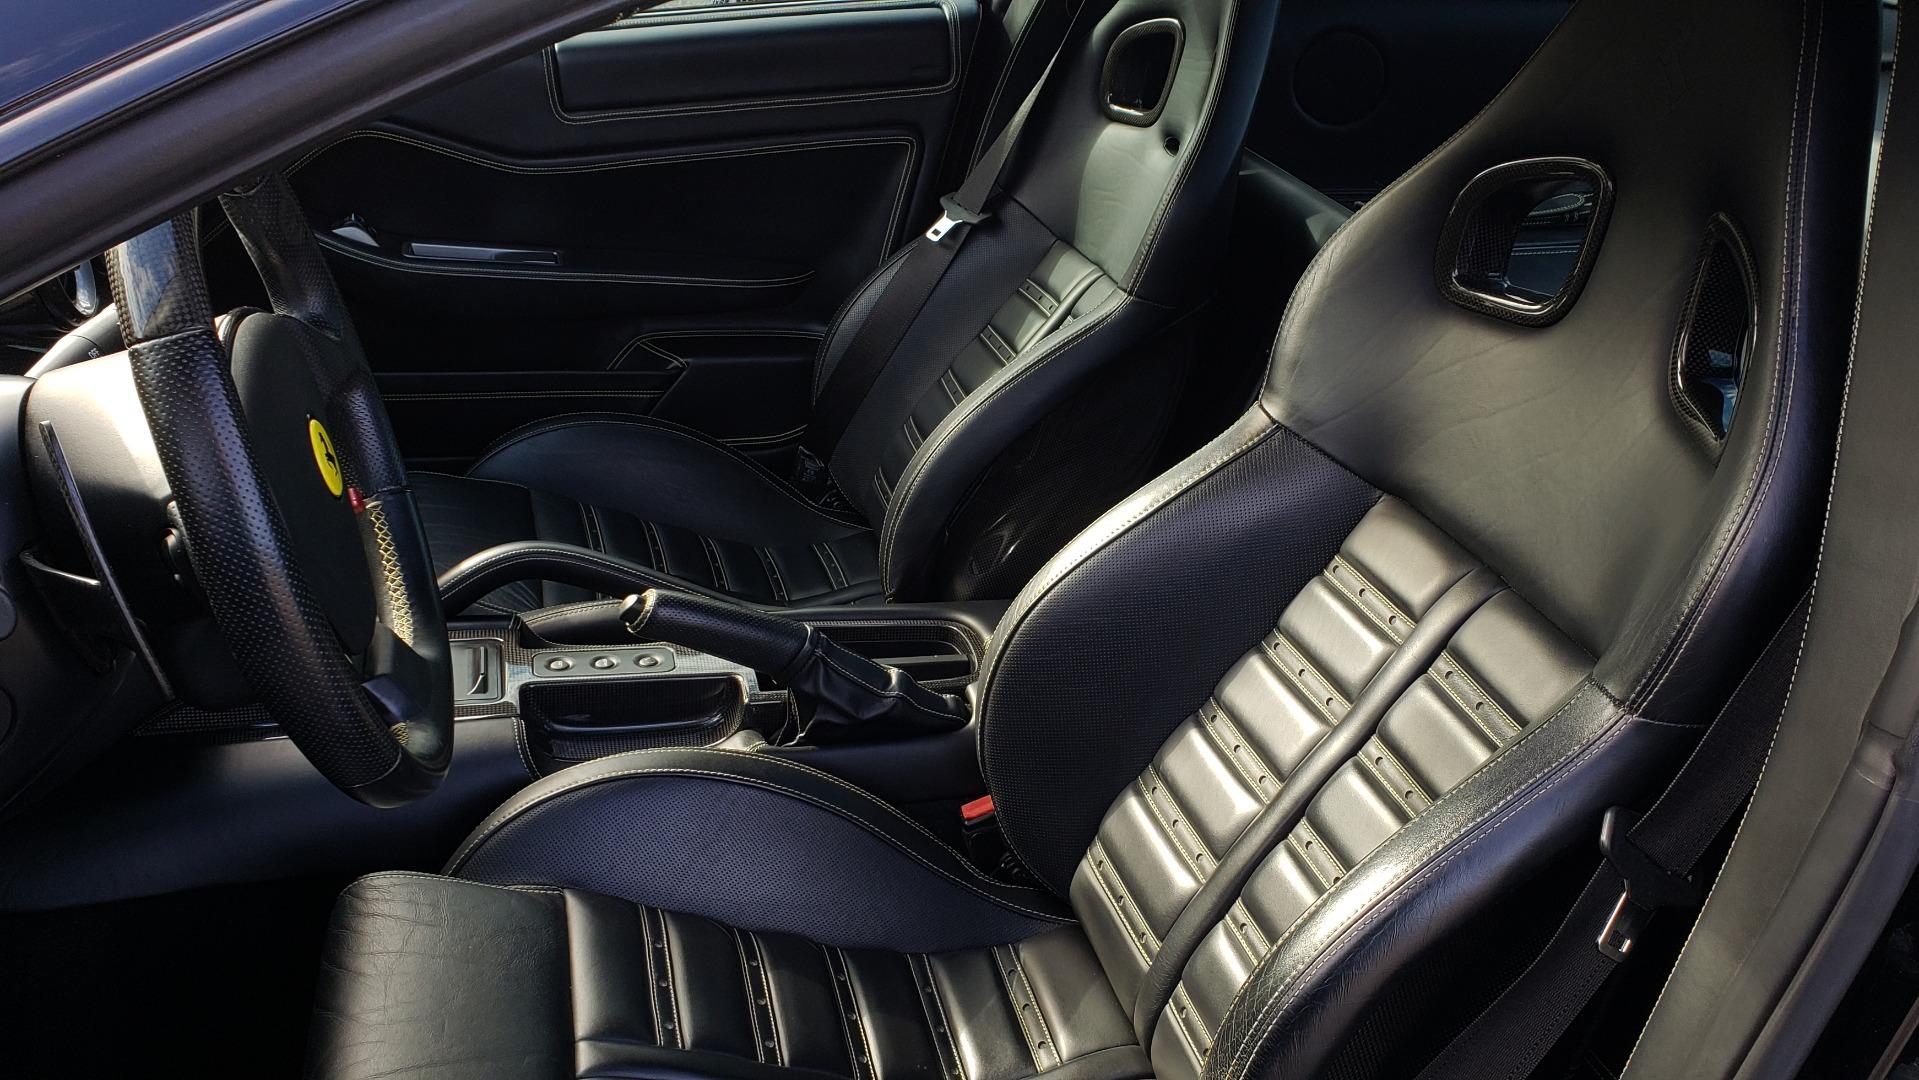 Used 2007 Ferrari 599 GTB FIORANO HGTE / V12 / F1 TRANS / NAV / BOSE / CUSTOM WHEELS for sale $109,999 at Formula Imports in Charlotte NC 28227 84